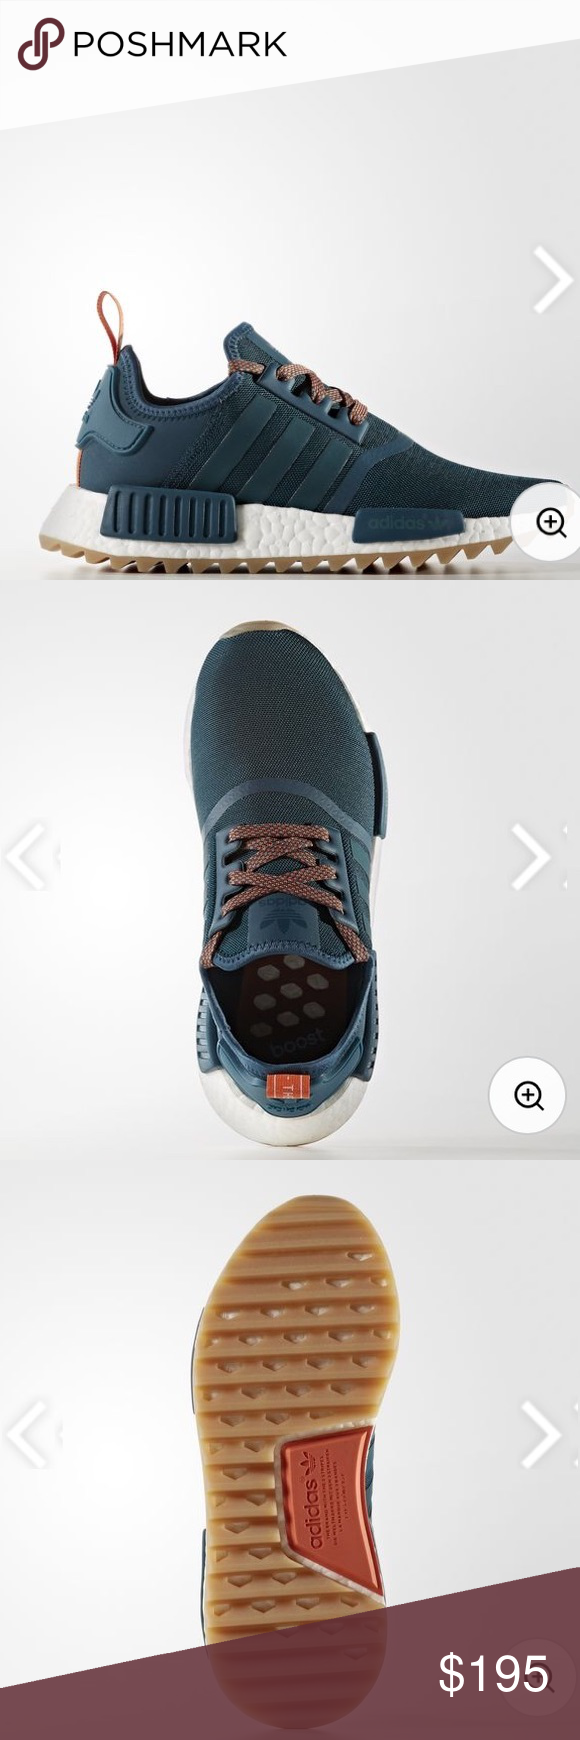 Yulgls New Adidas trainers NMD R1 Primeknit 'OGWhite Release